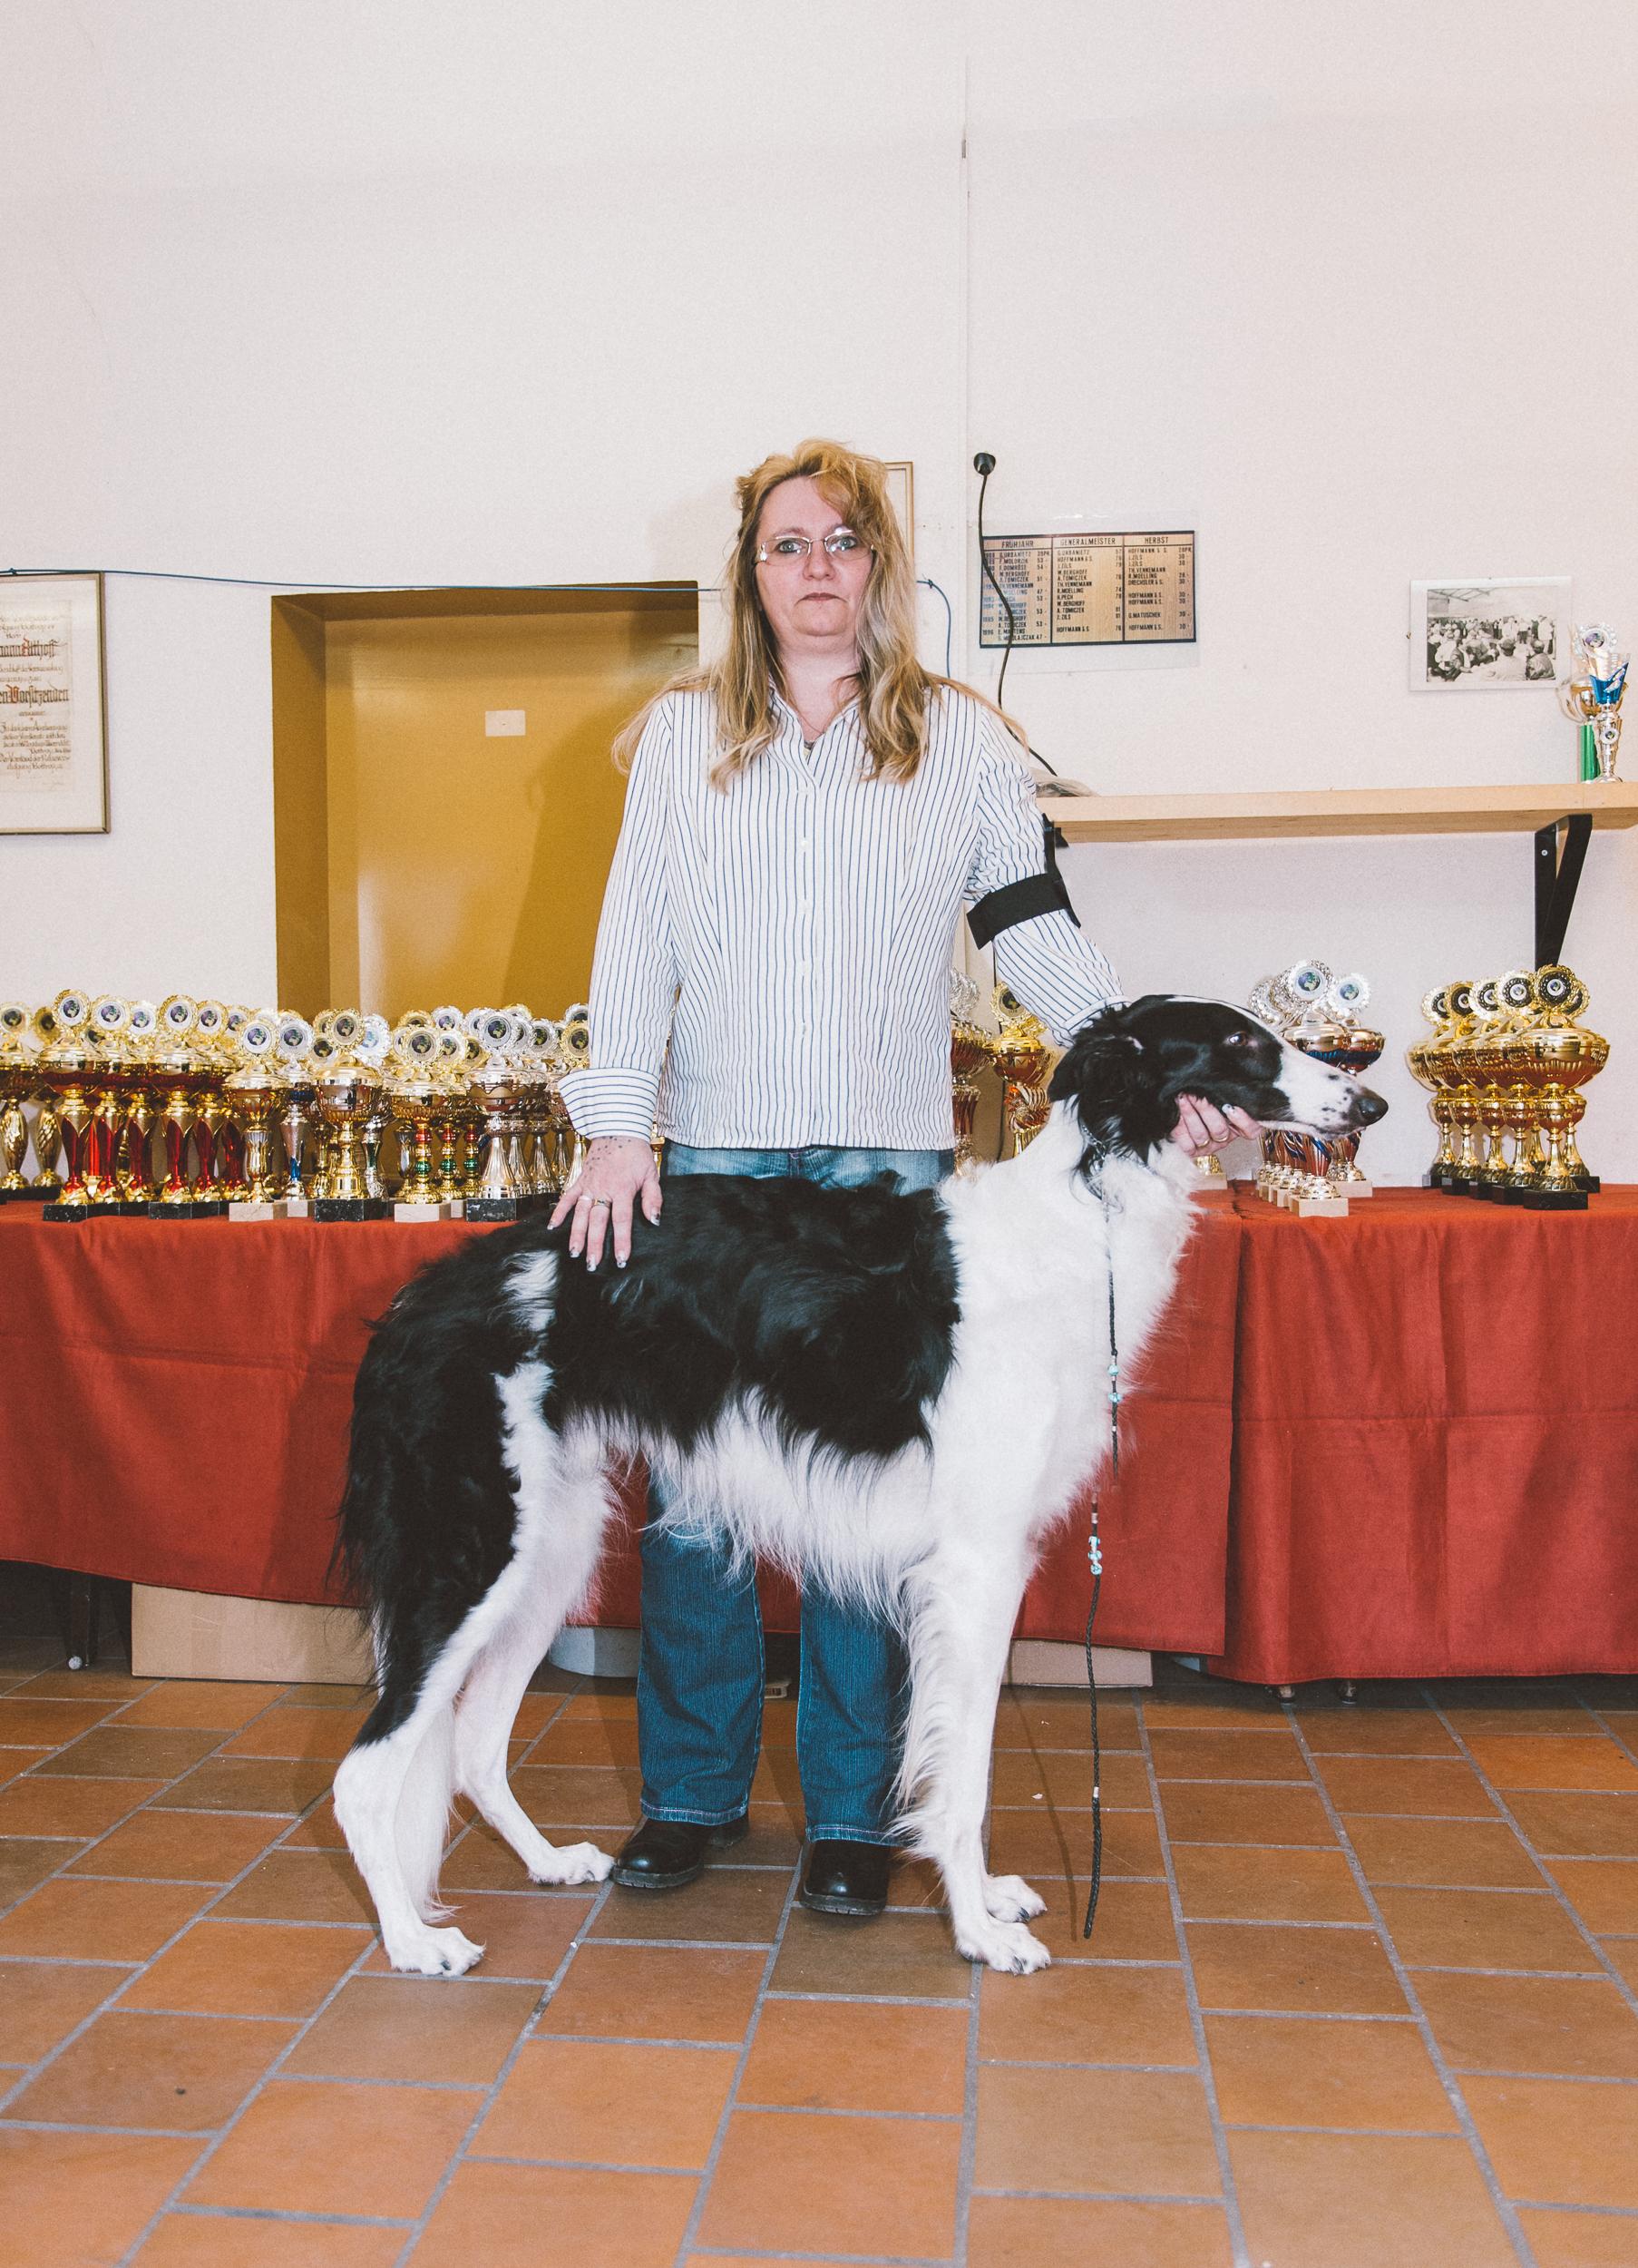 klaus+dyba+dog+show-15.jpg